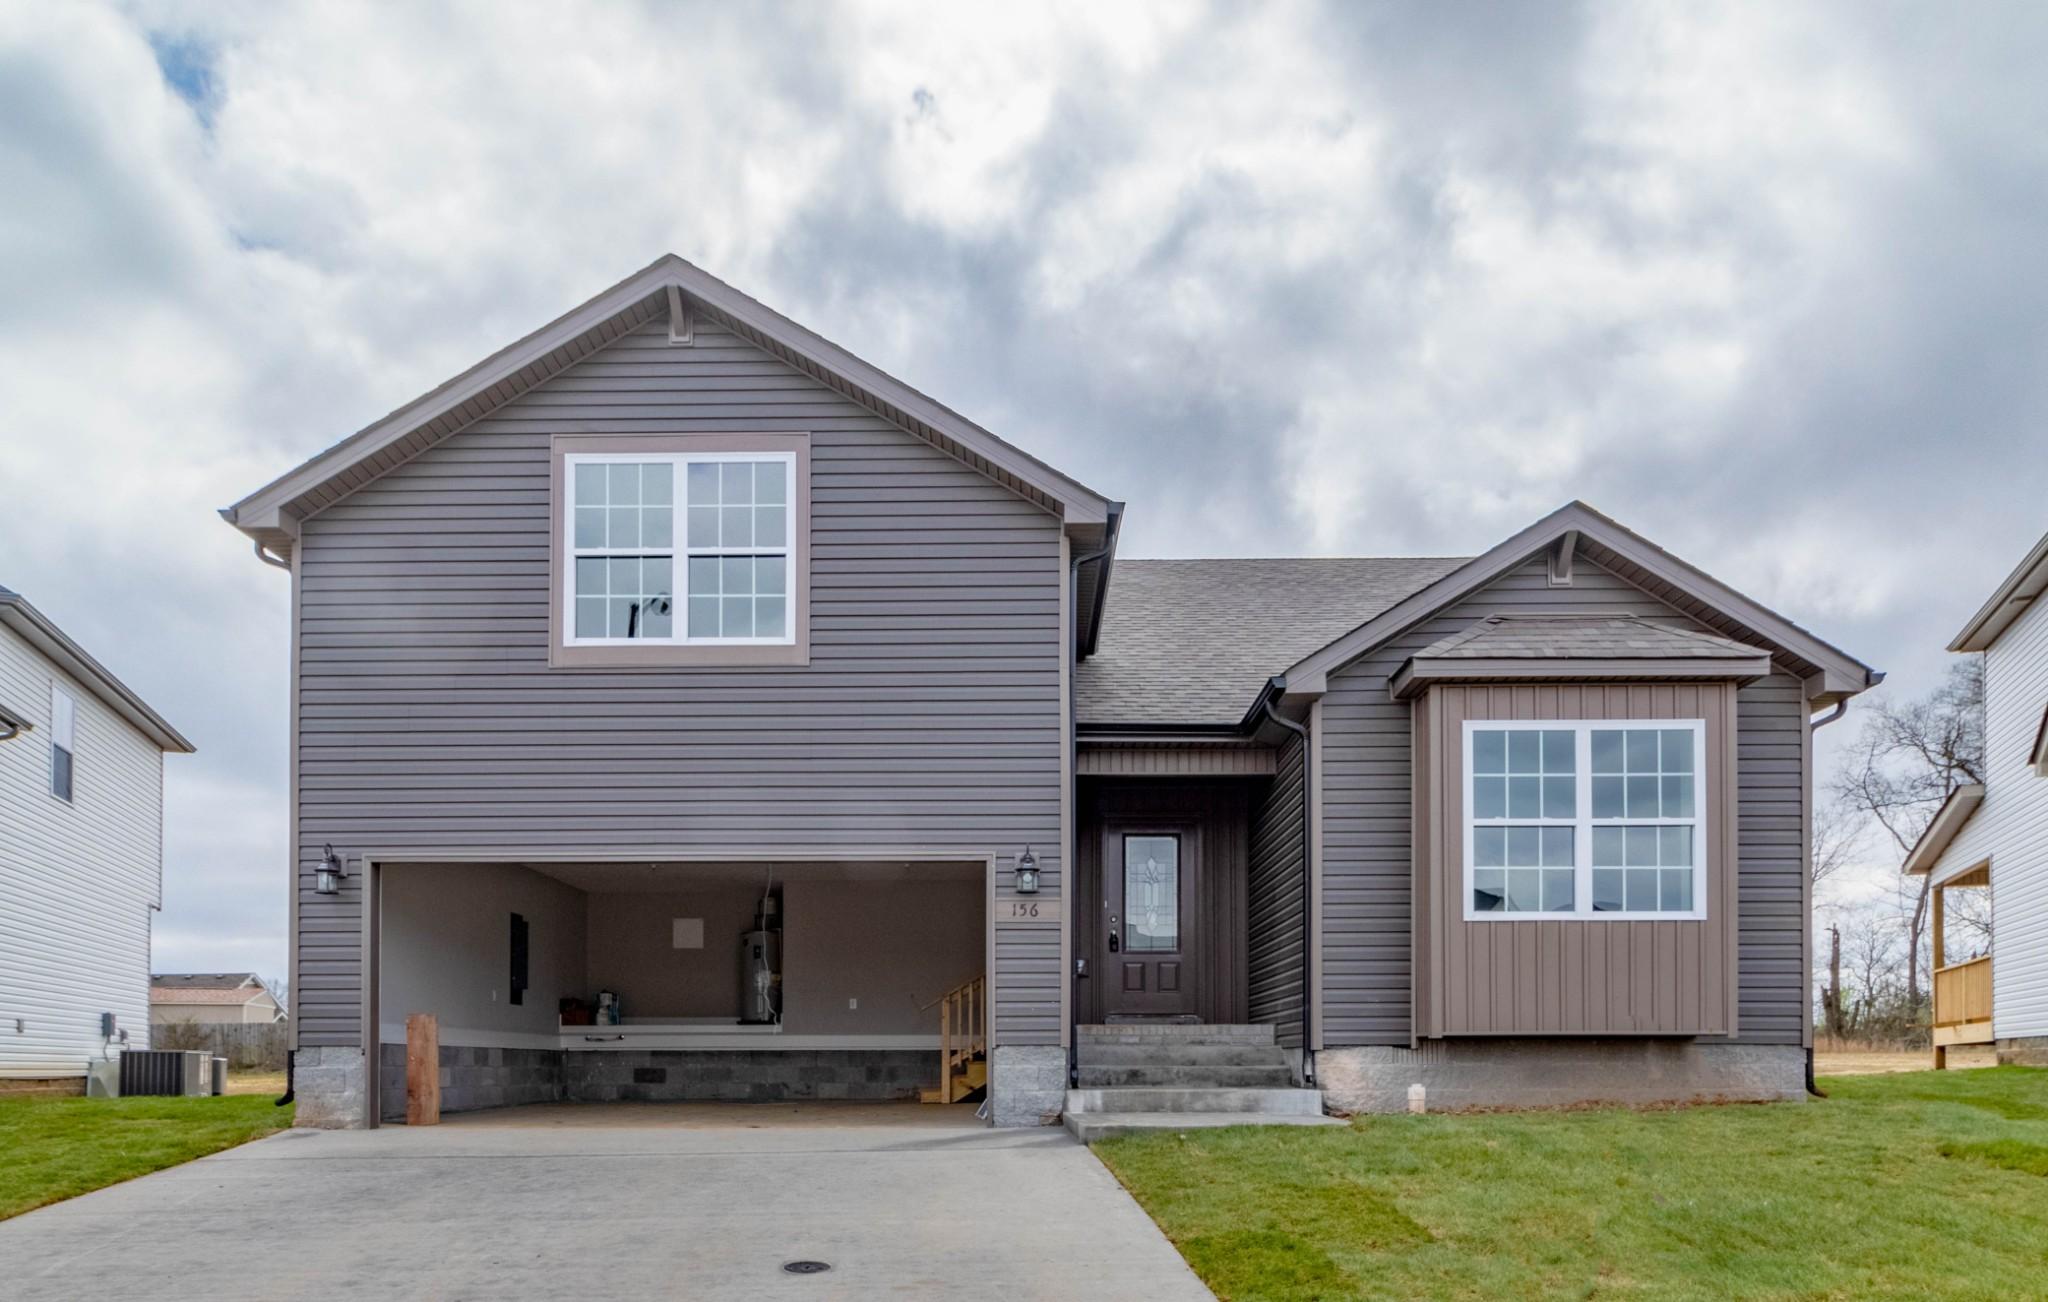 156 Sambar Dr, Clarksville, TN 37040 - Clarksville, TN real estate listing